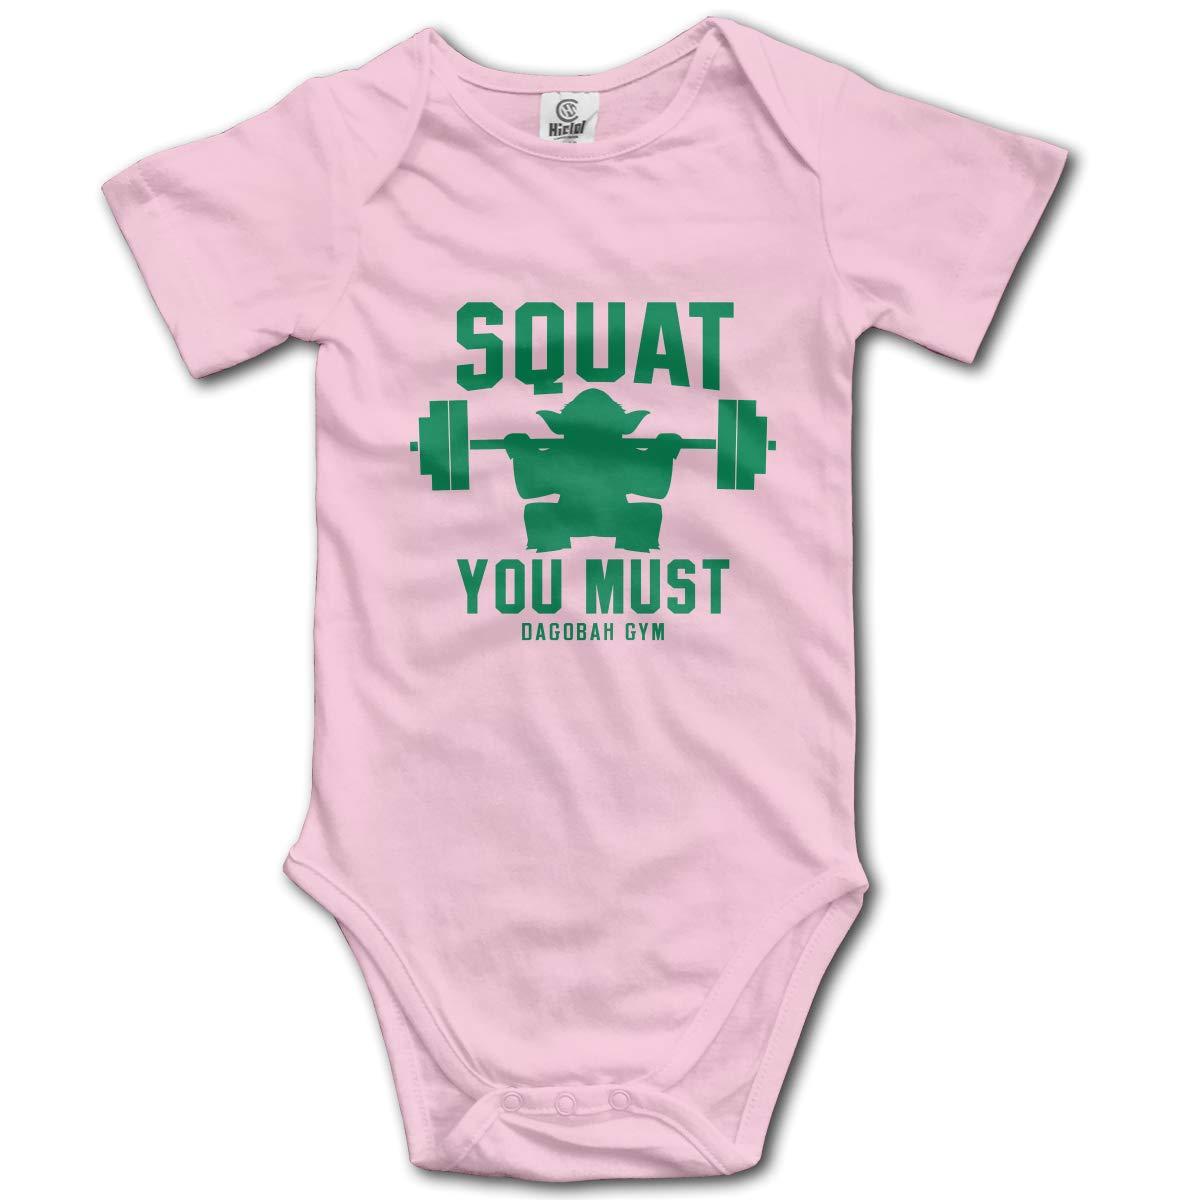 e58170d4a Amazon.com  LWI DIW Squat You Must Fashion Newborn Baby Boys Girls Funny  Short-Sleeve Bodysuit Romper Outfits  Clothing